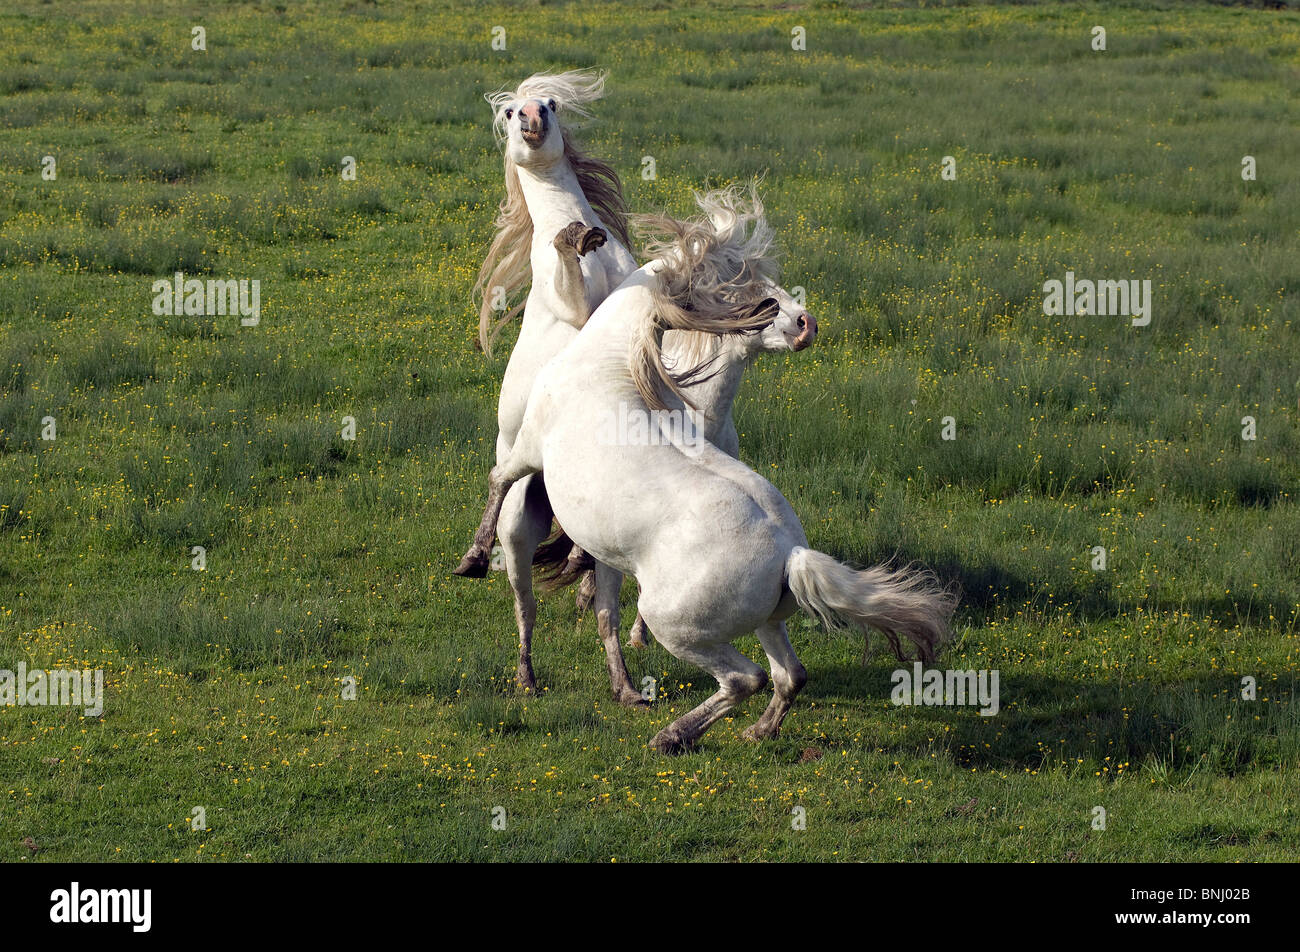 Pura Raza Espanola PRE Pure Race Espagnole Spanish breed fighting fight Animal Animals two horses horse - Stock Image